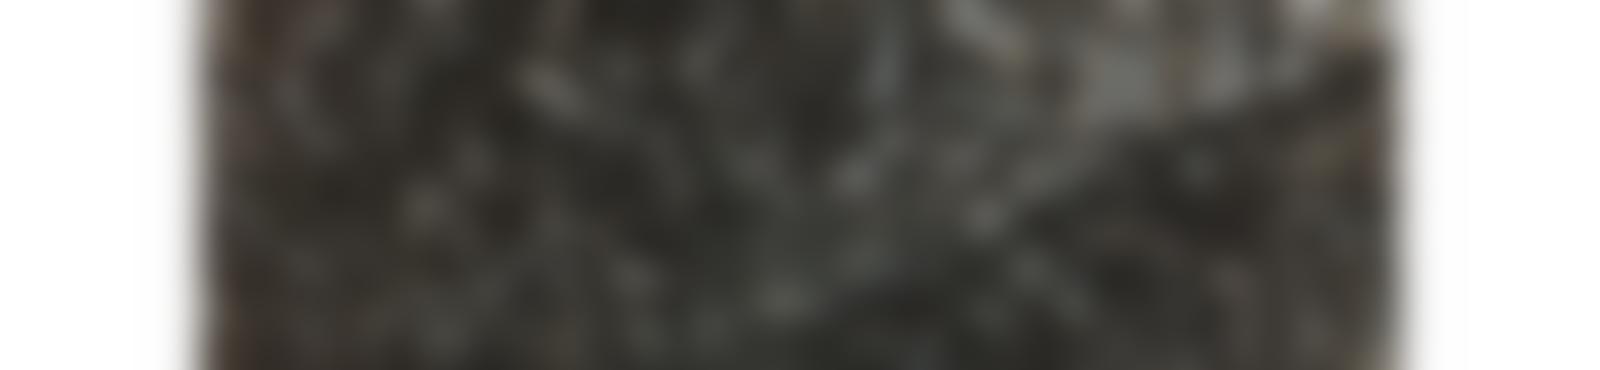 Blurred f963664d 3b75 42a7 b4c5 7cbb03f0afc2